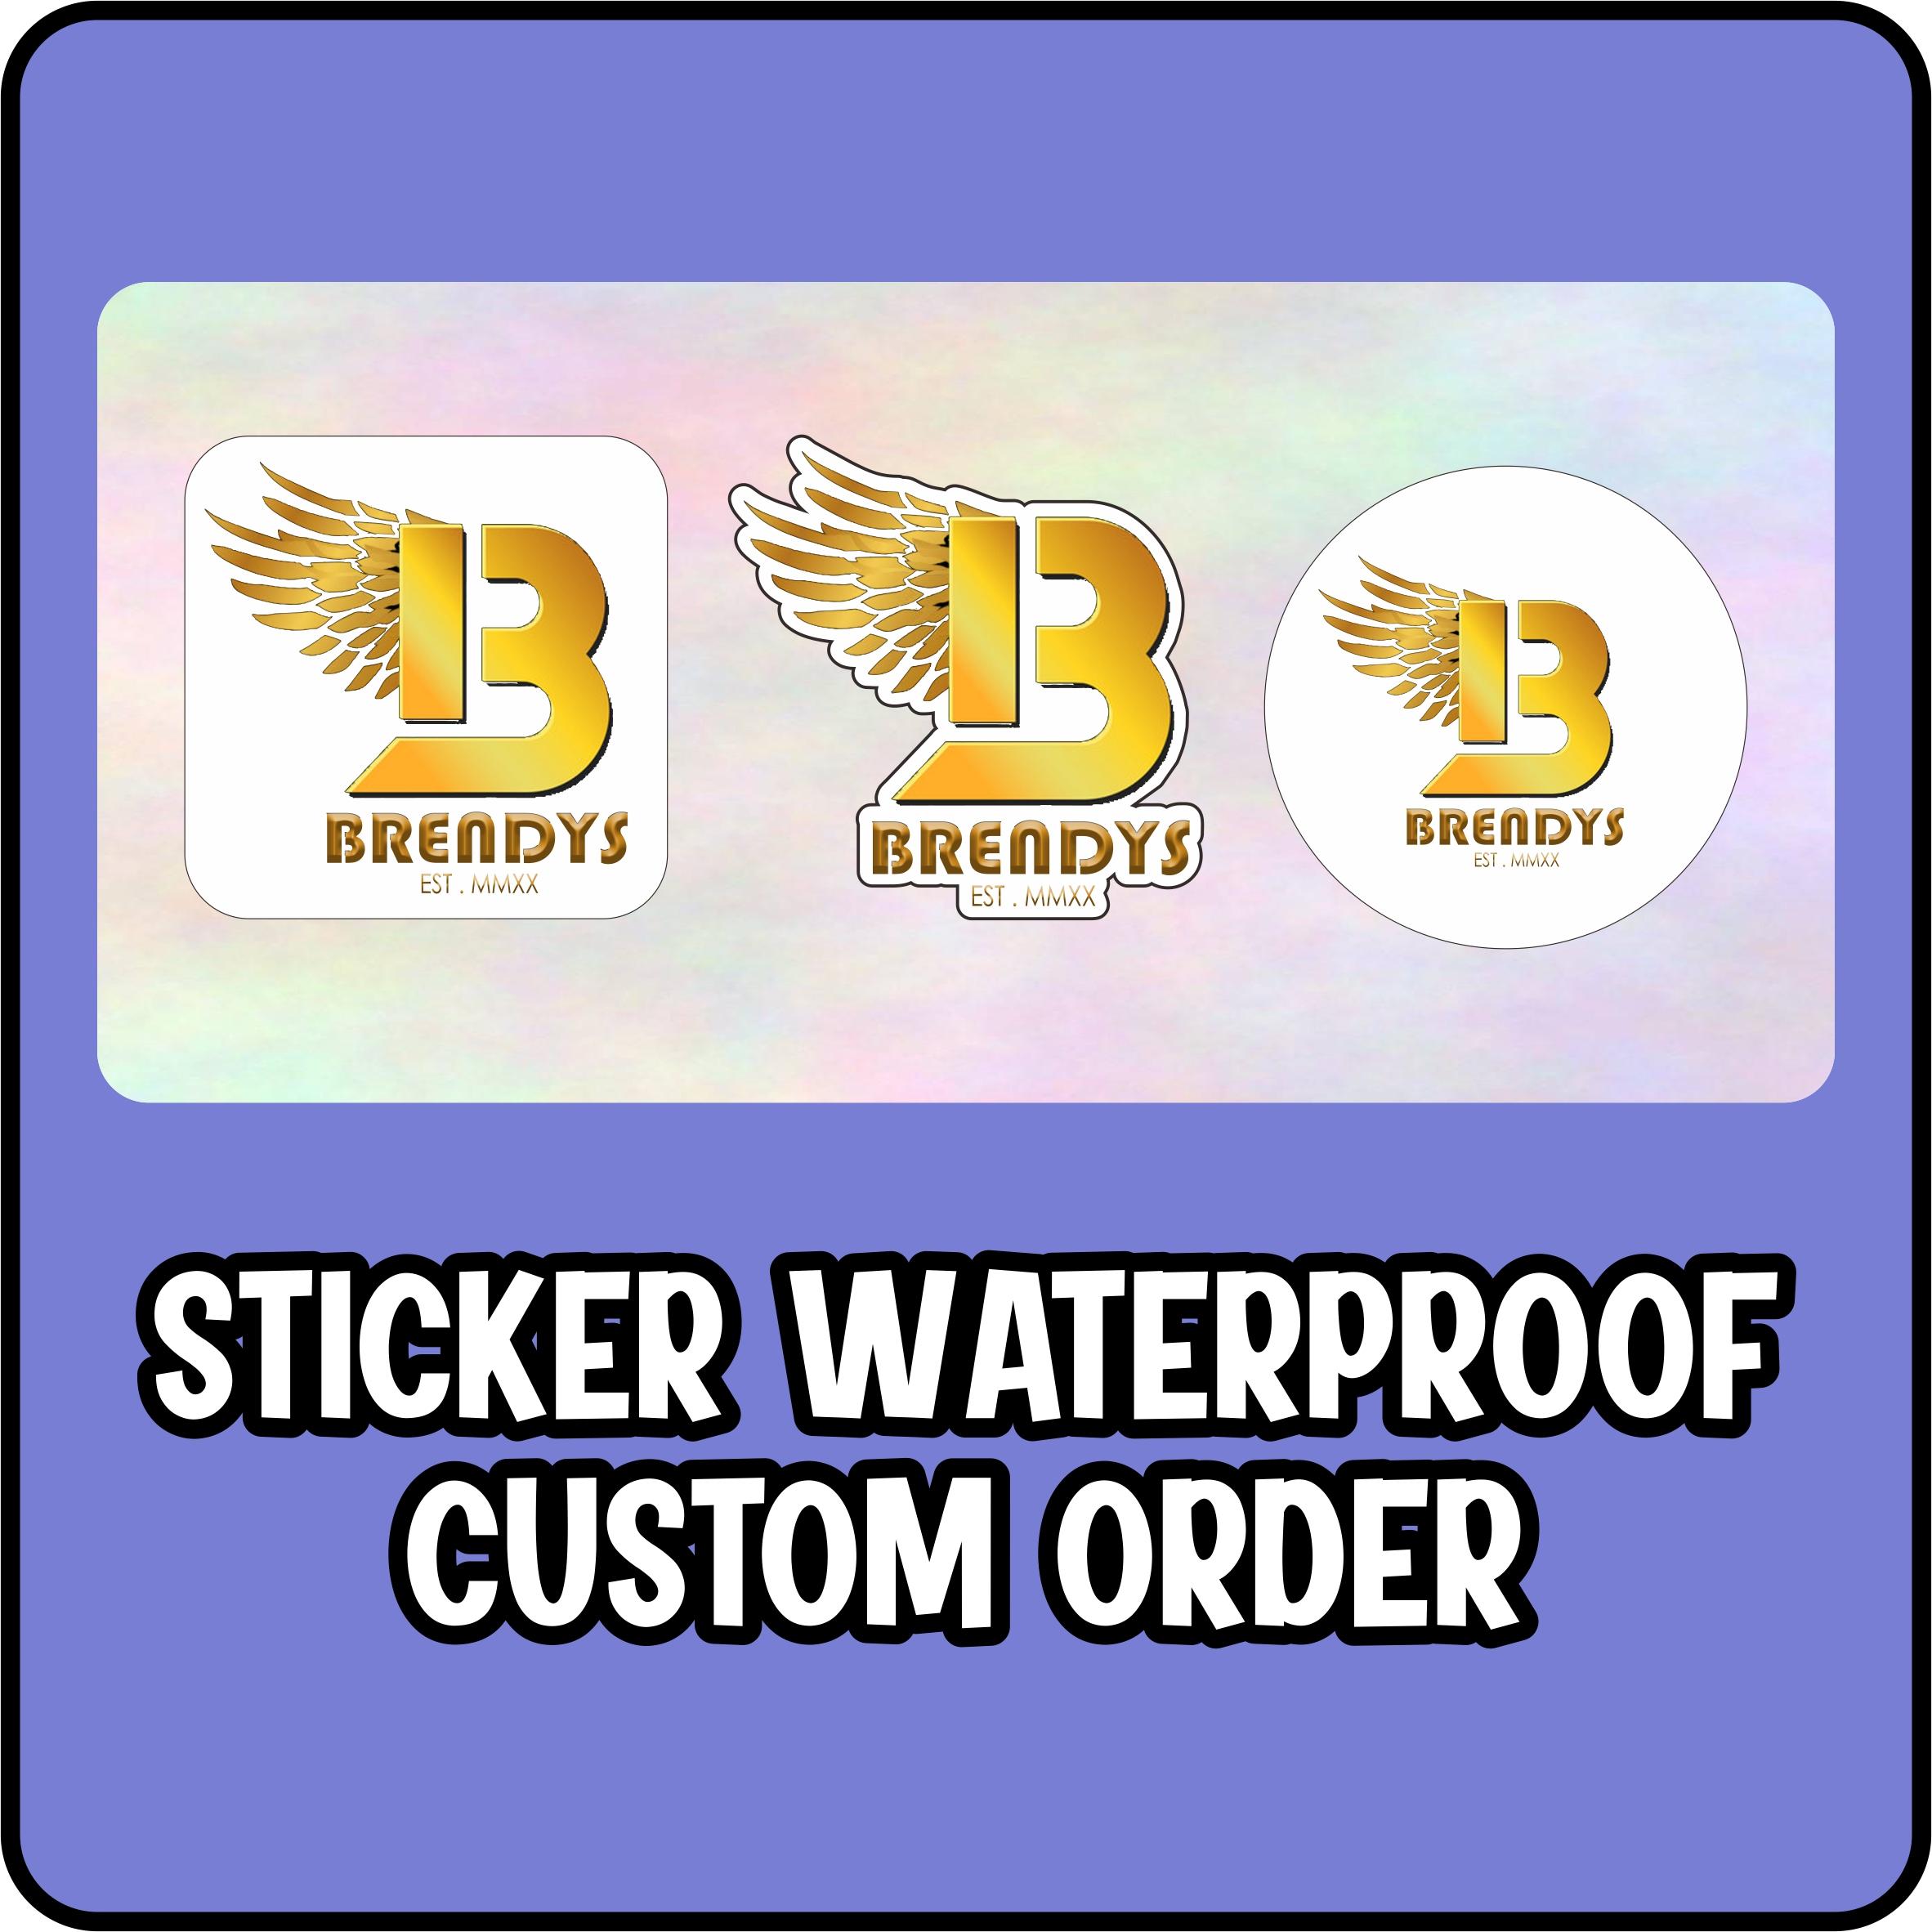 Sticker Waterproof Custom Order